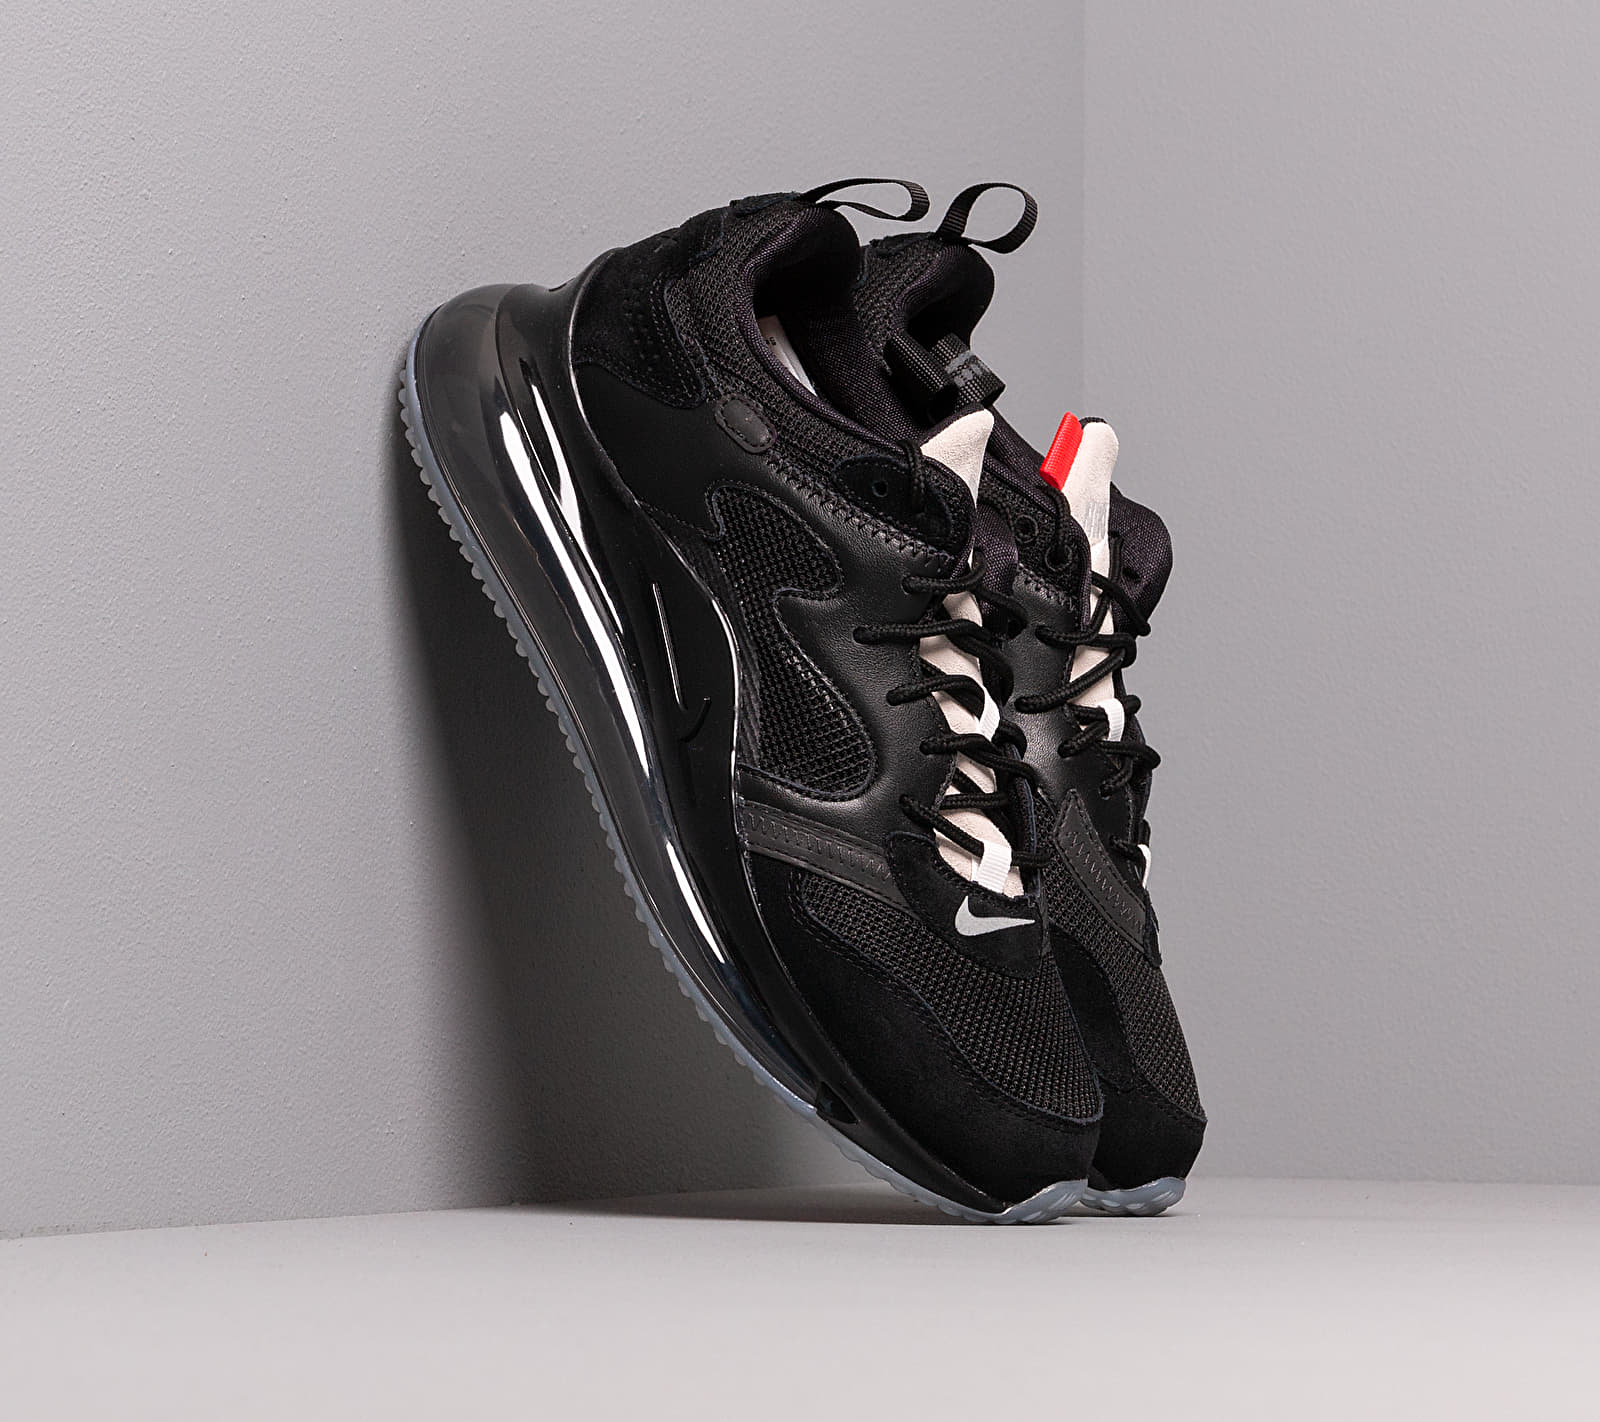 Nike Air Max 720 / Obj Black/ Summit White-Red Orbit EUR 44.5